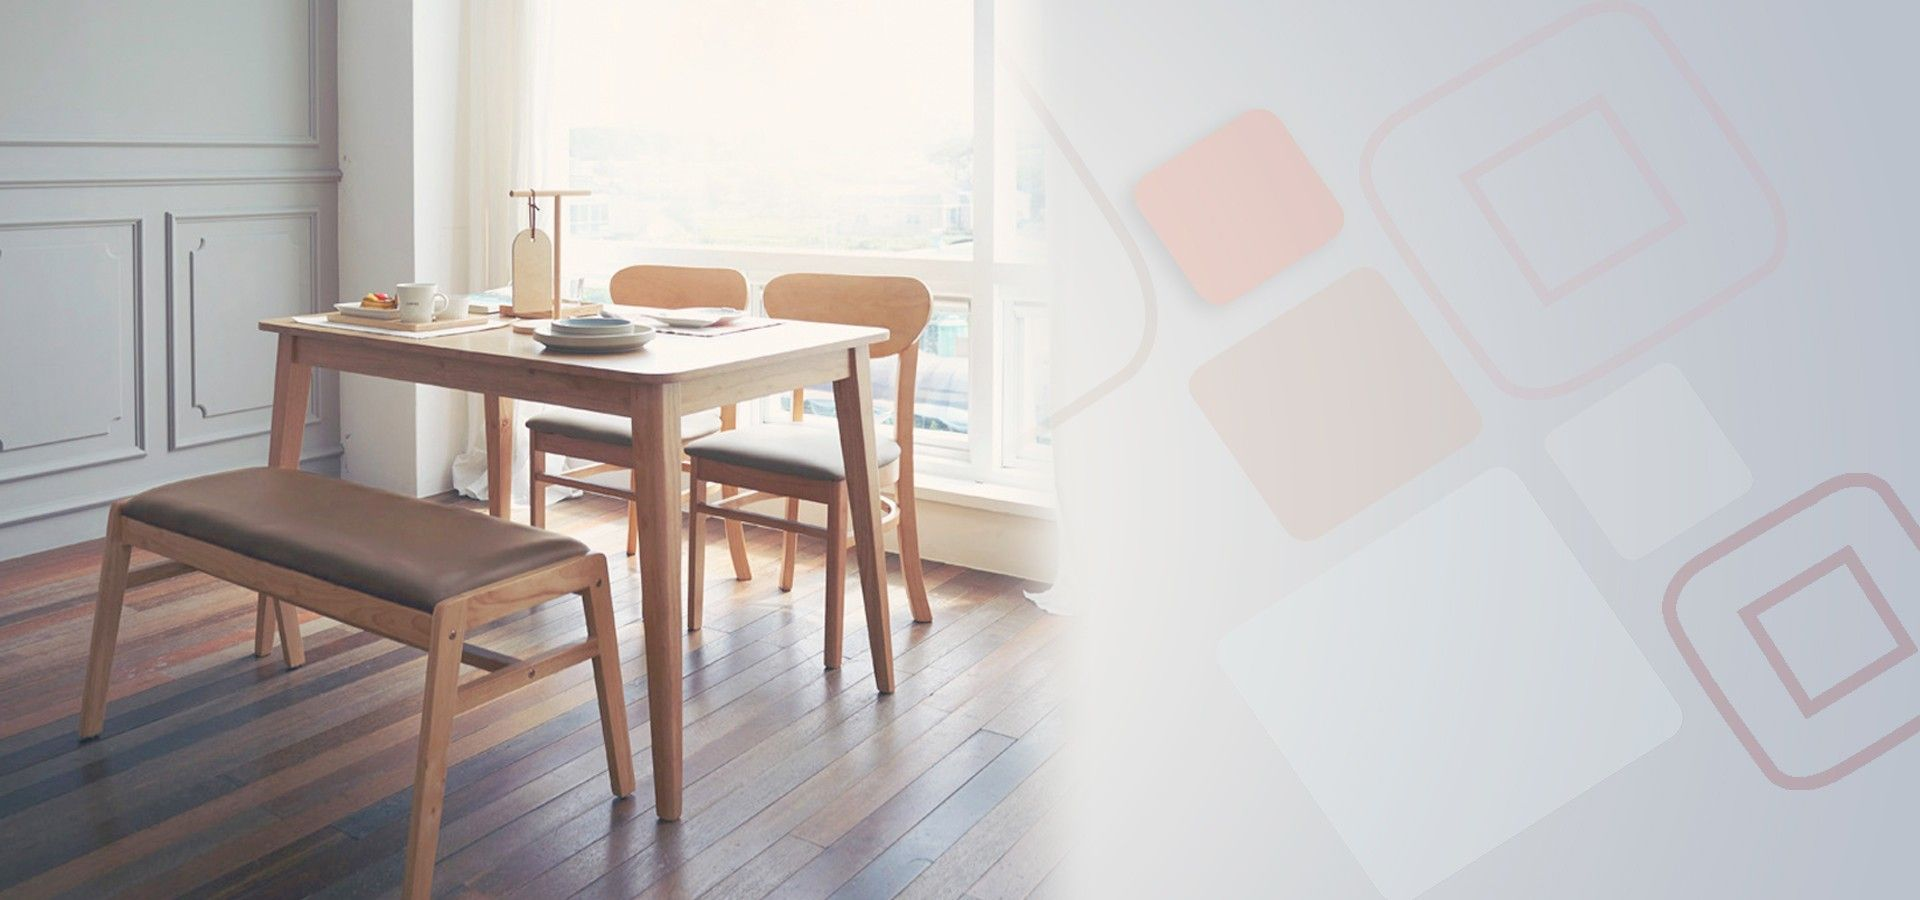 Peachy Kokoro Scandinavian Compact 4 Seater Dining Set A 1150 Interior Design Ideas Gentotryabchikinfo